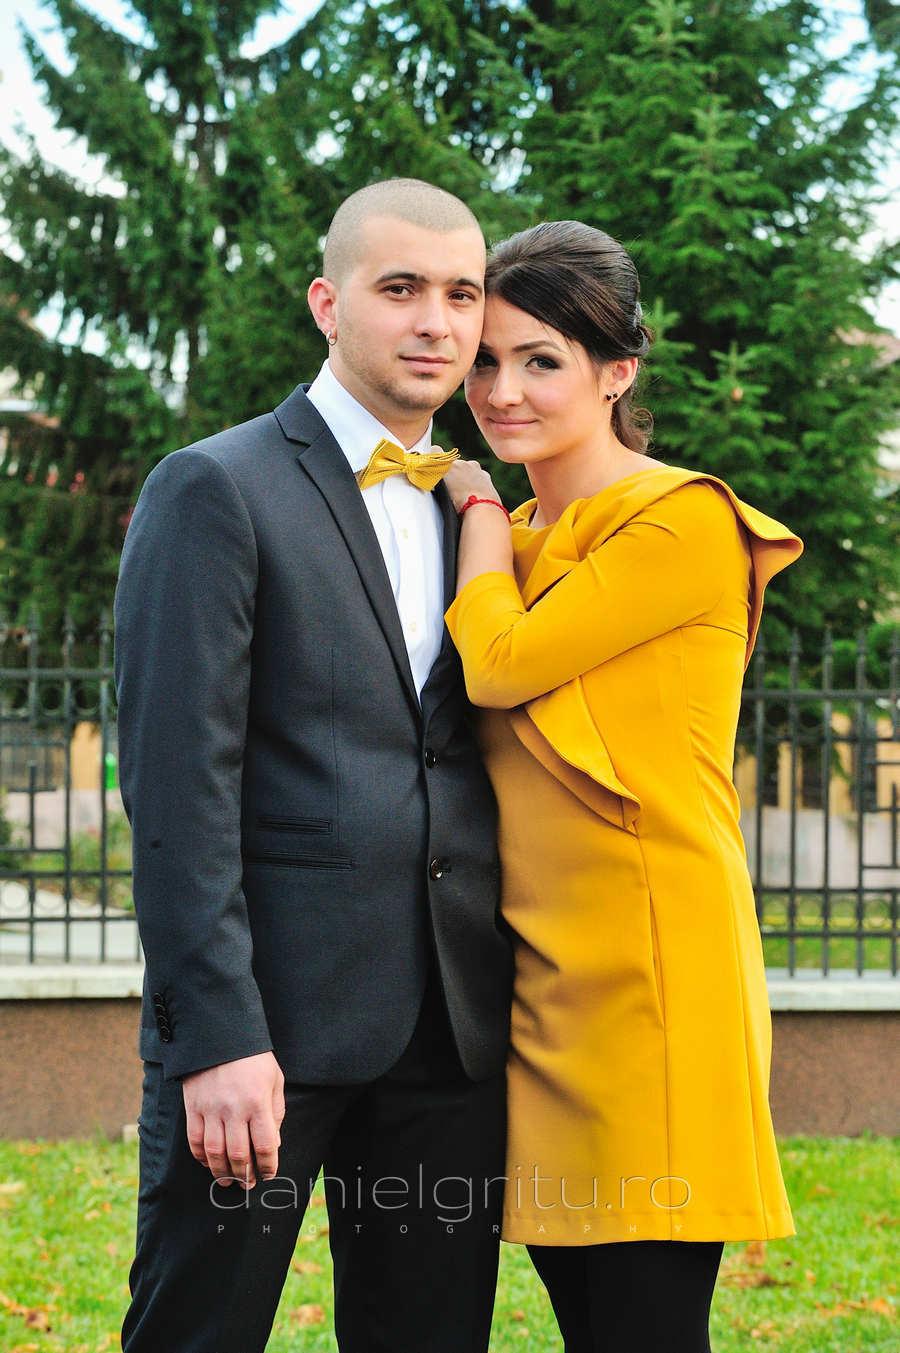 Foto cununie civila | www.danielgritu.ro | Georgiana si Dragos